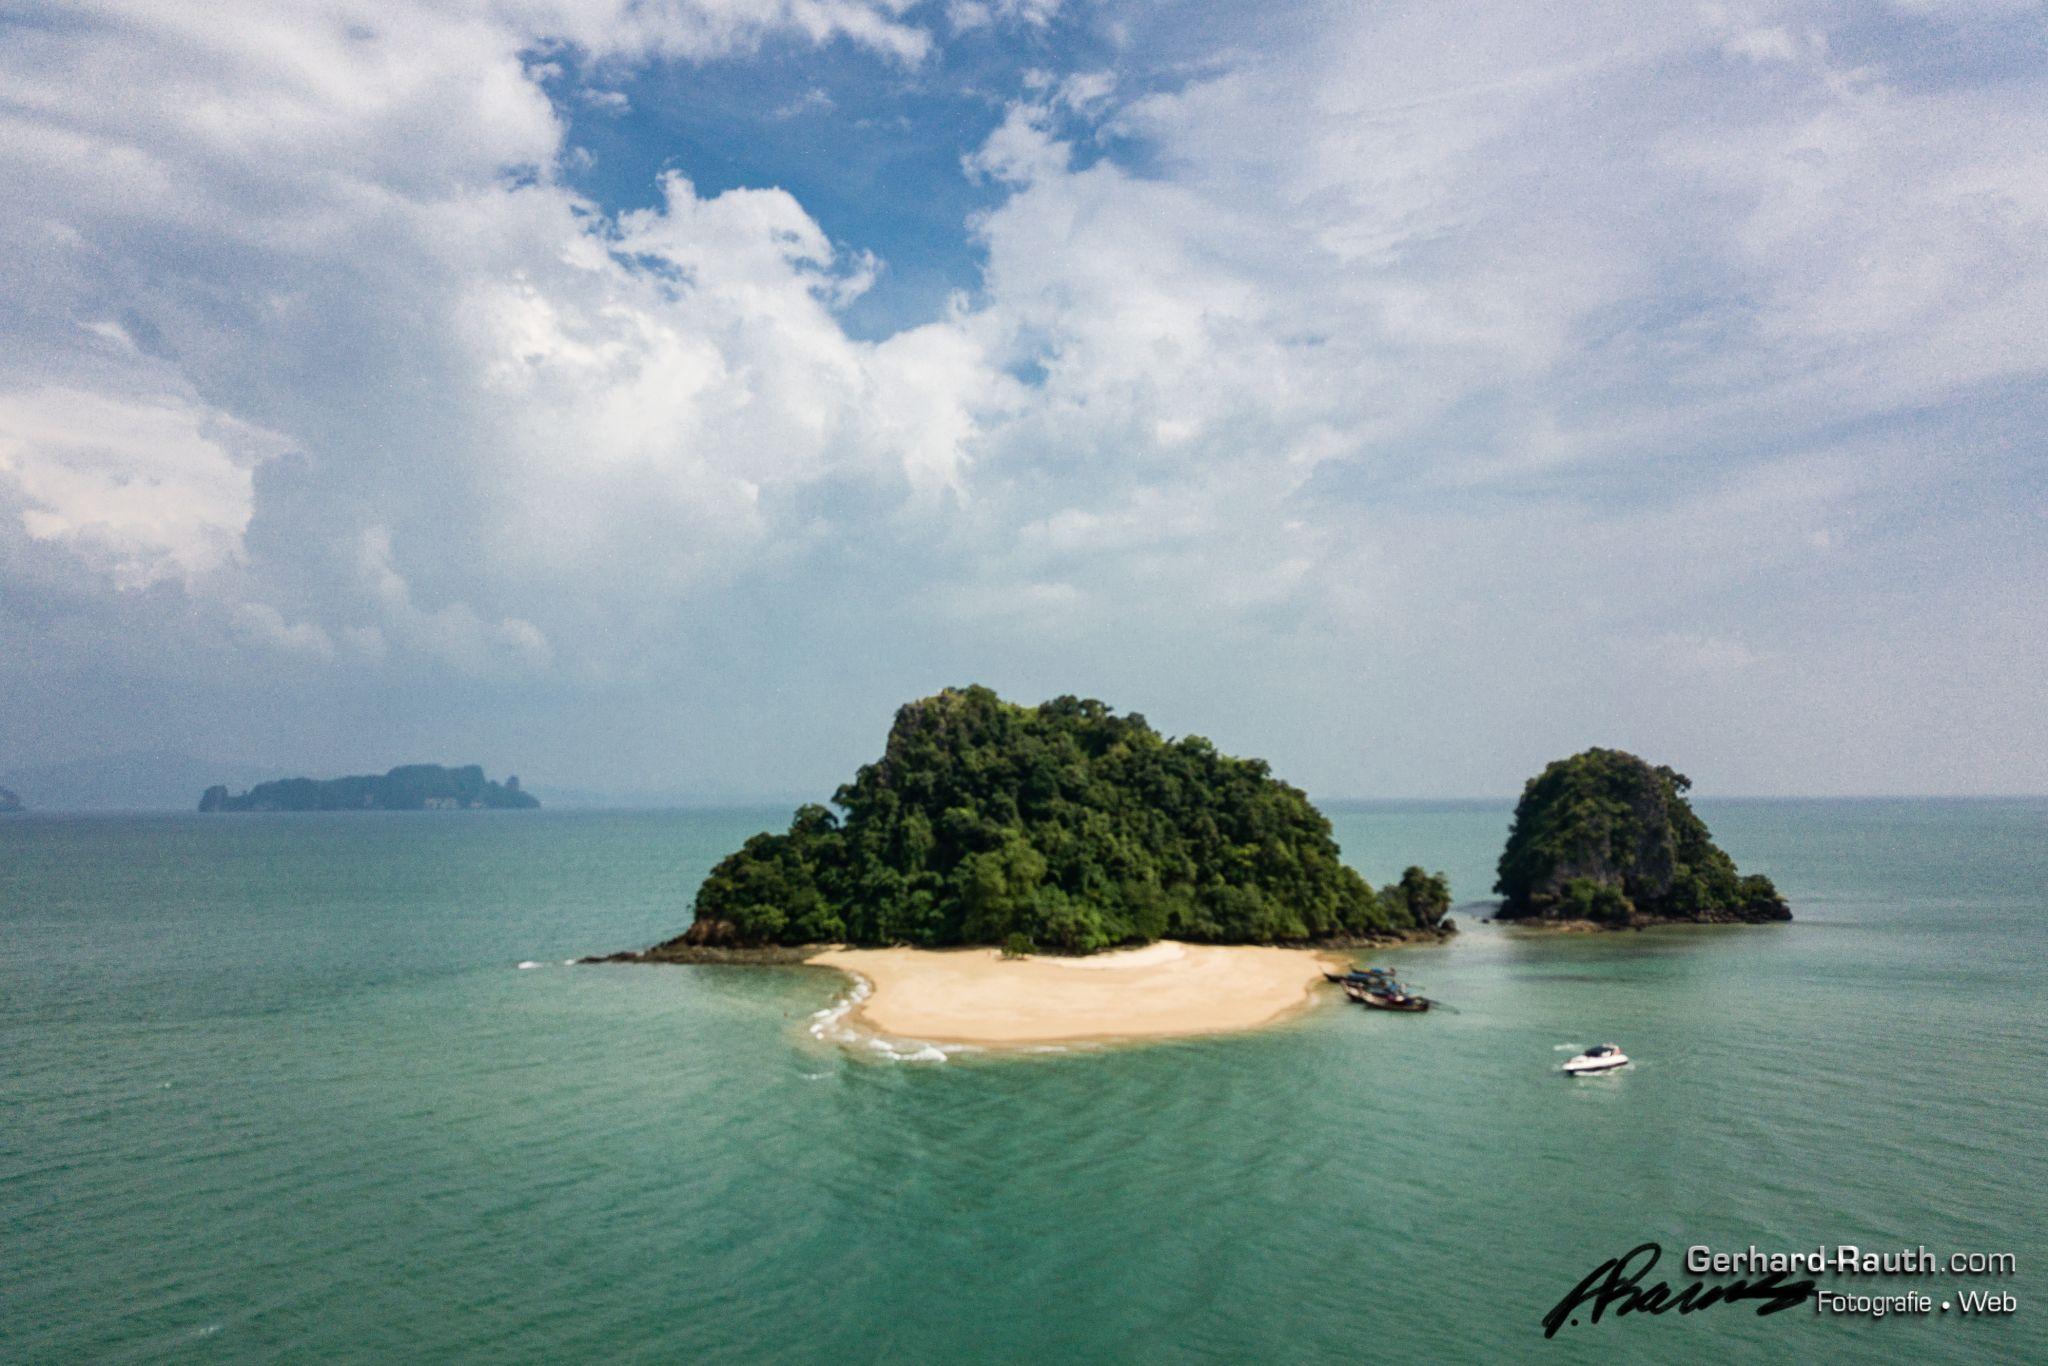 Tropical Island Koh Nok, Thailand